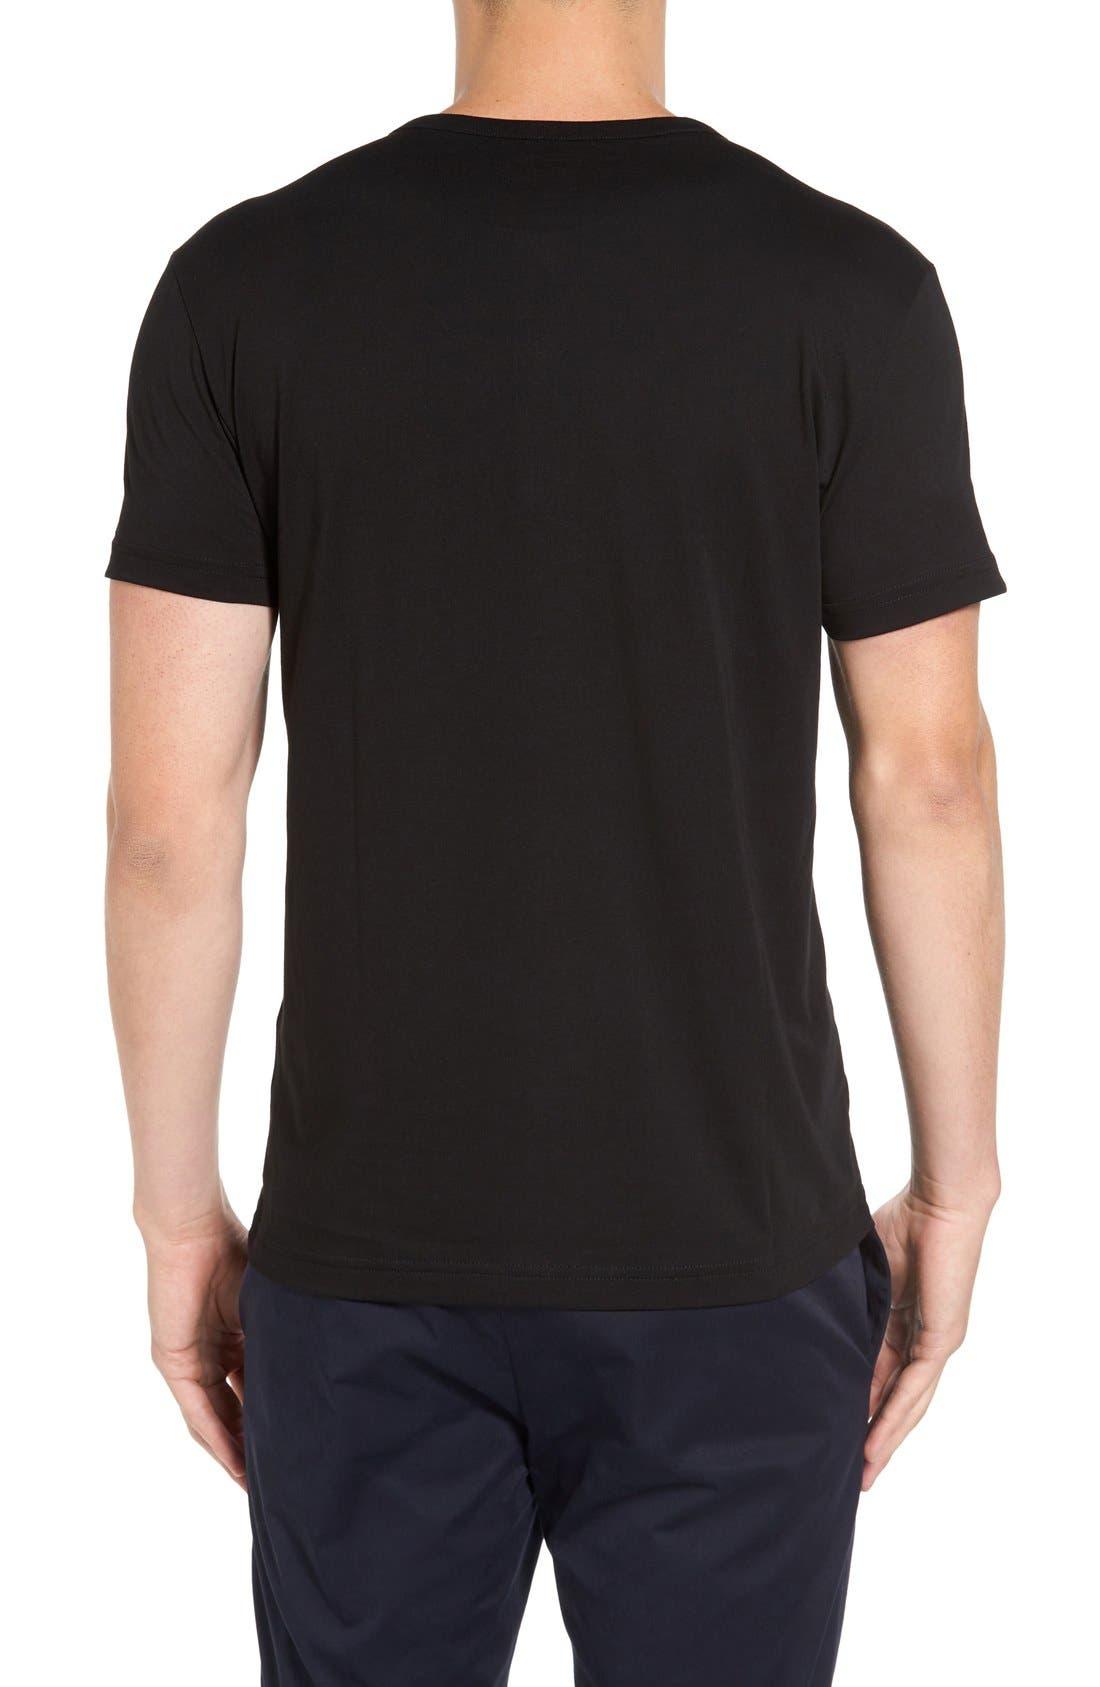 Black t shirt back and front plain - Black T Shirt Back And Front Plain 28